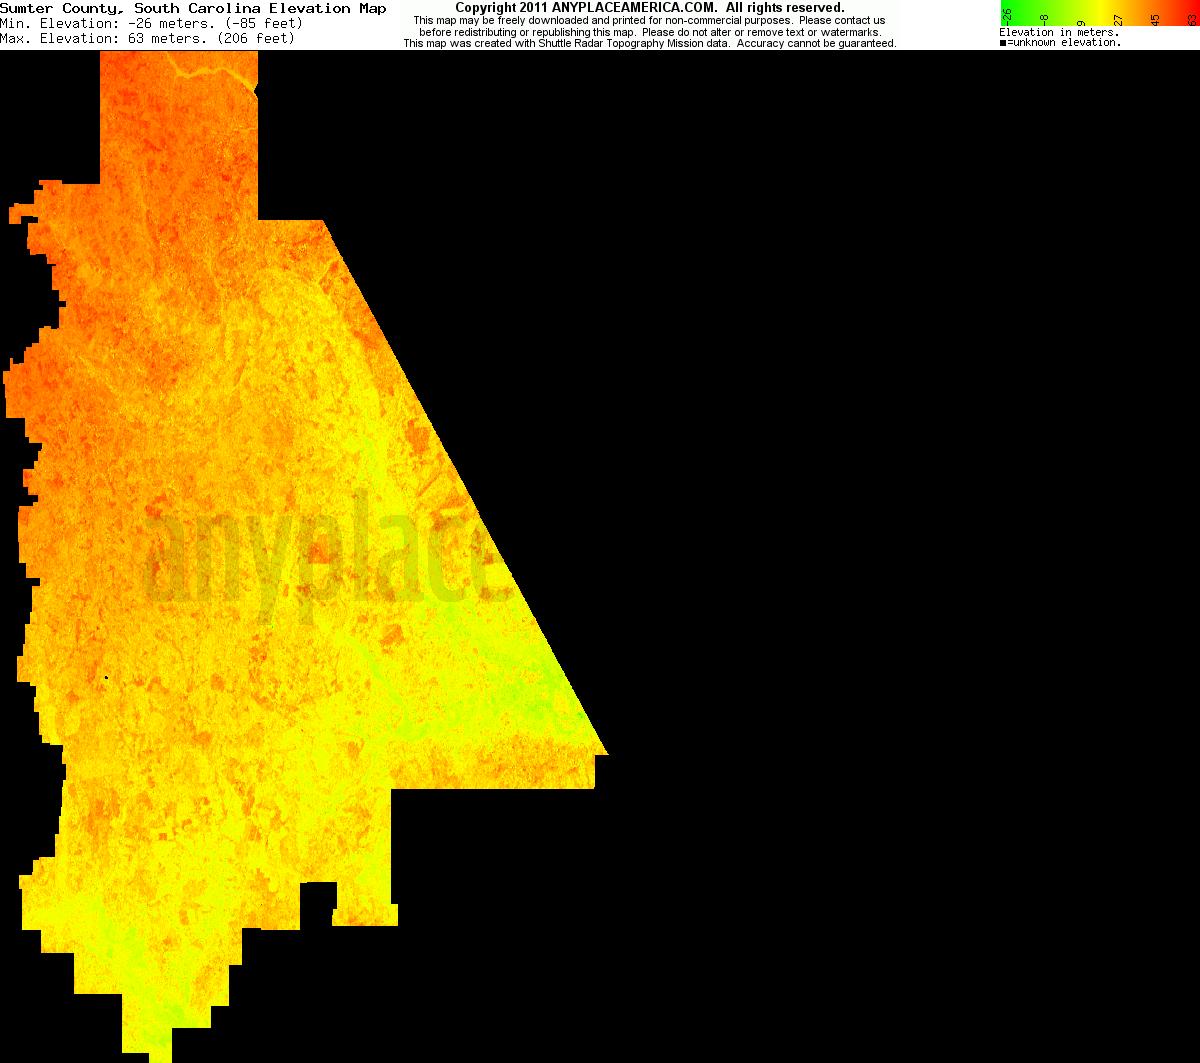 Free Sumter County, South Carolina Topo Maps & Elevations